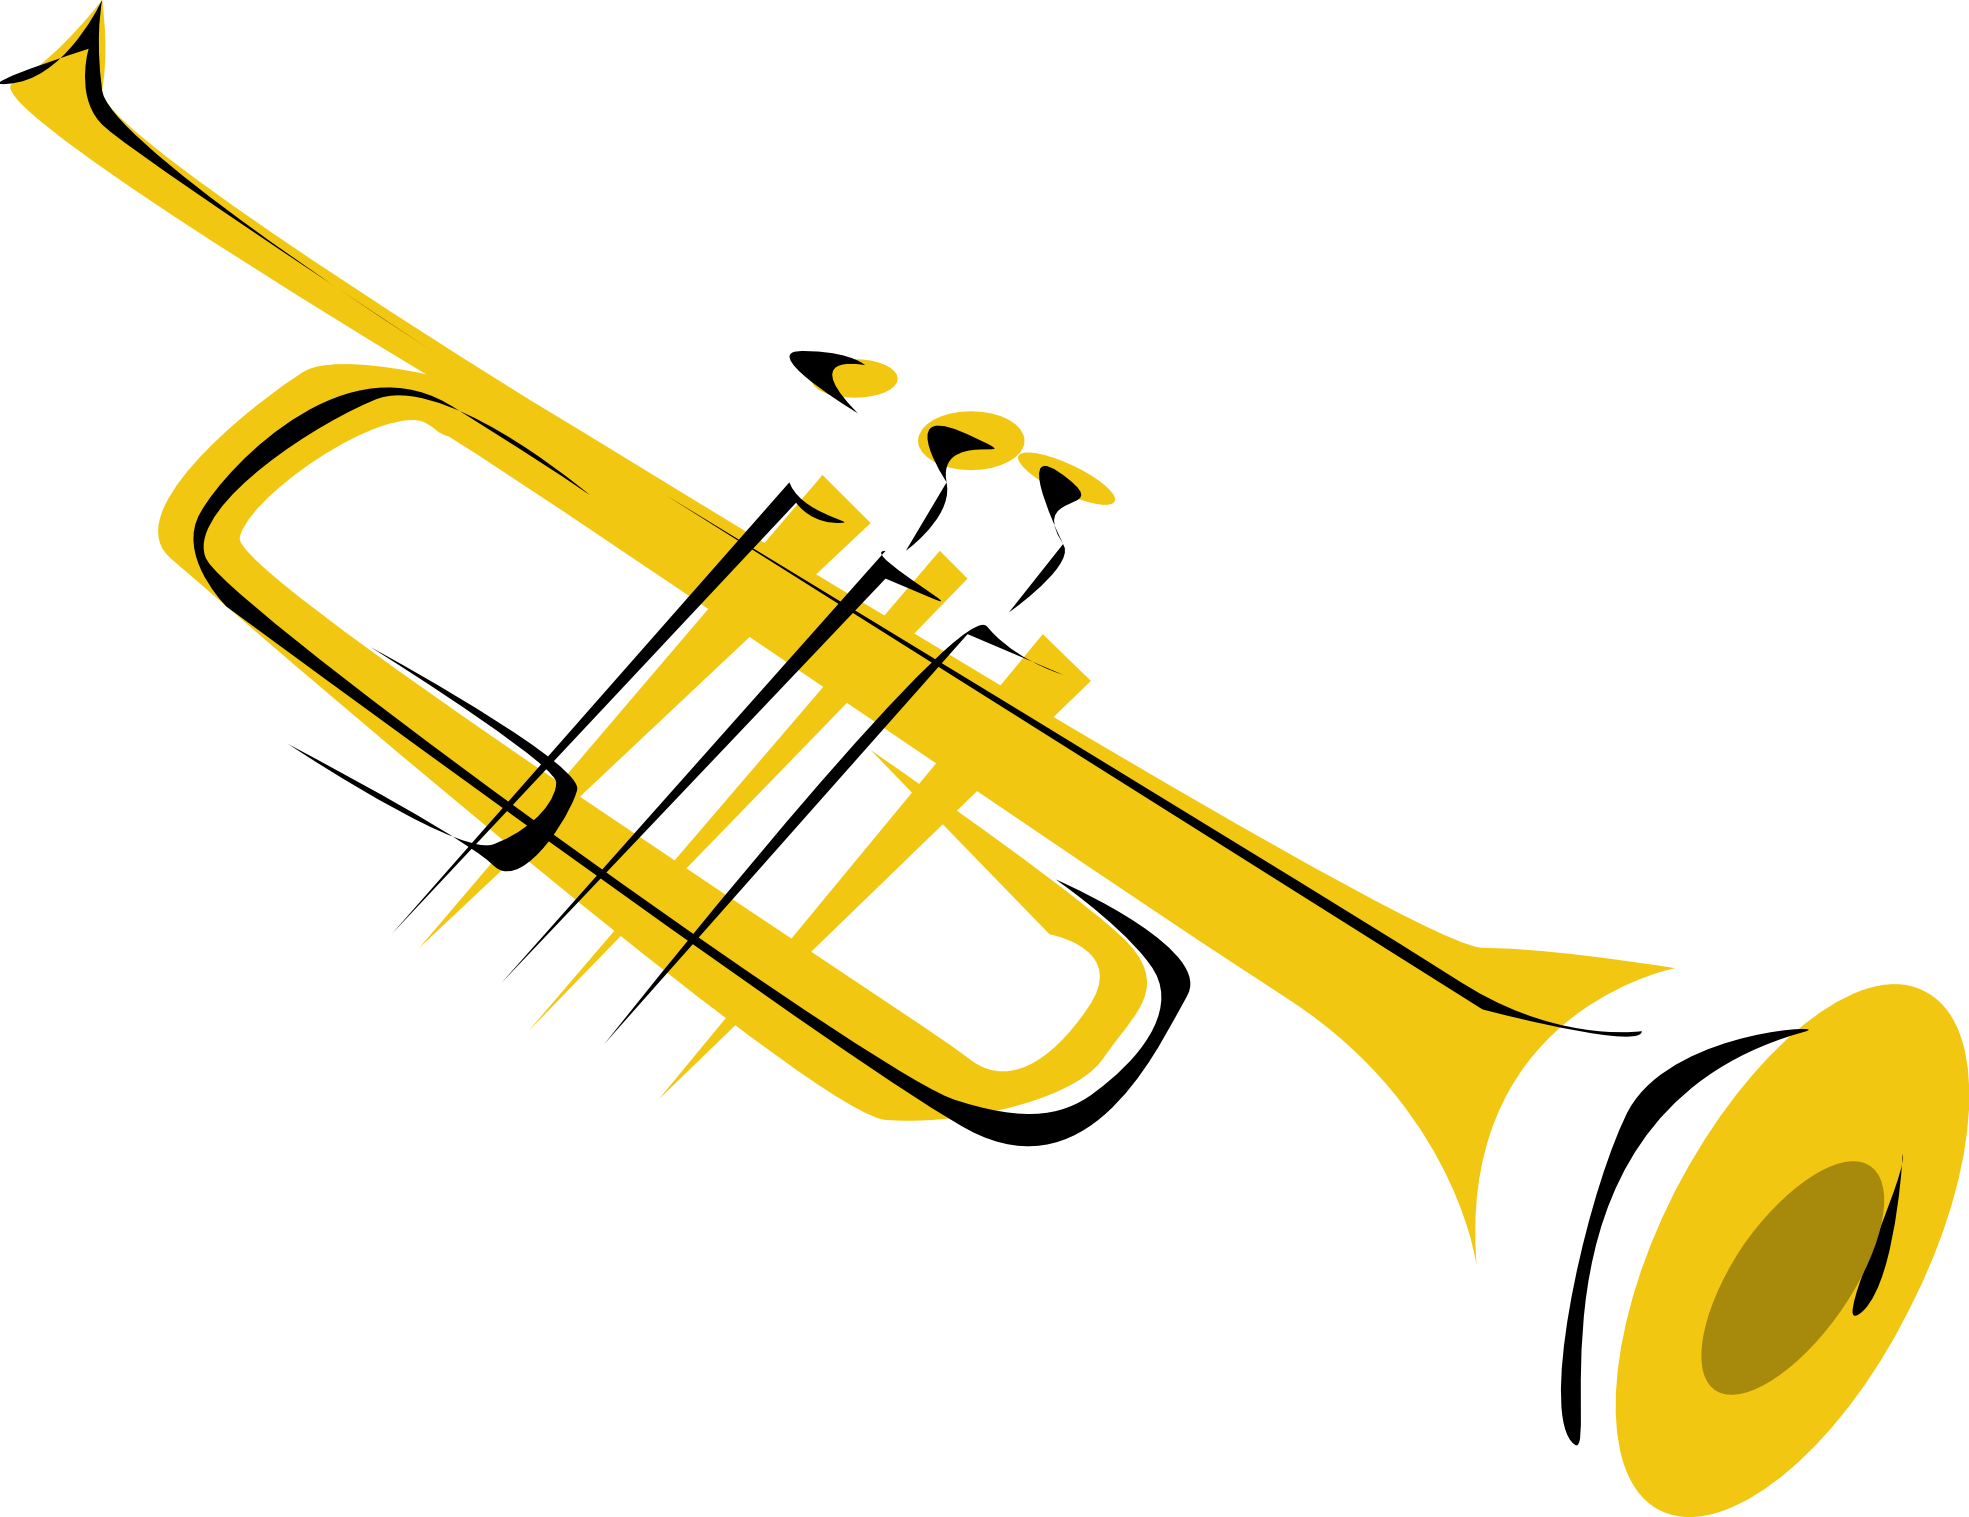 Free Trumpet Cliparts, Download Free Clip Art, Free Clip Art.